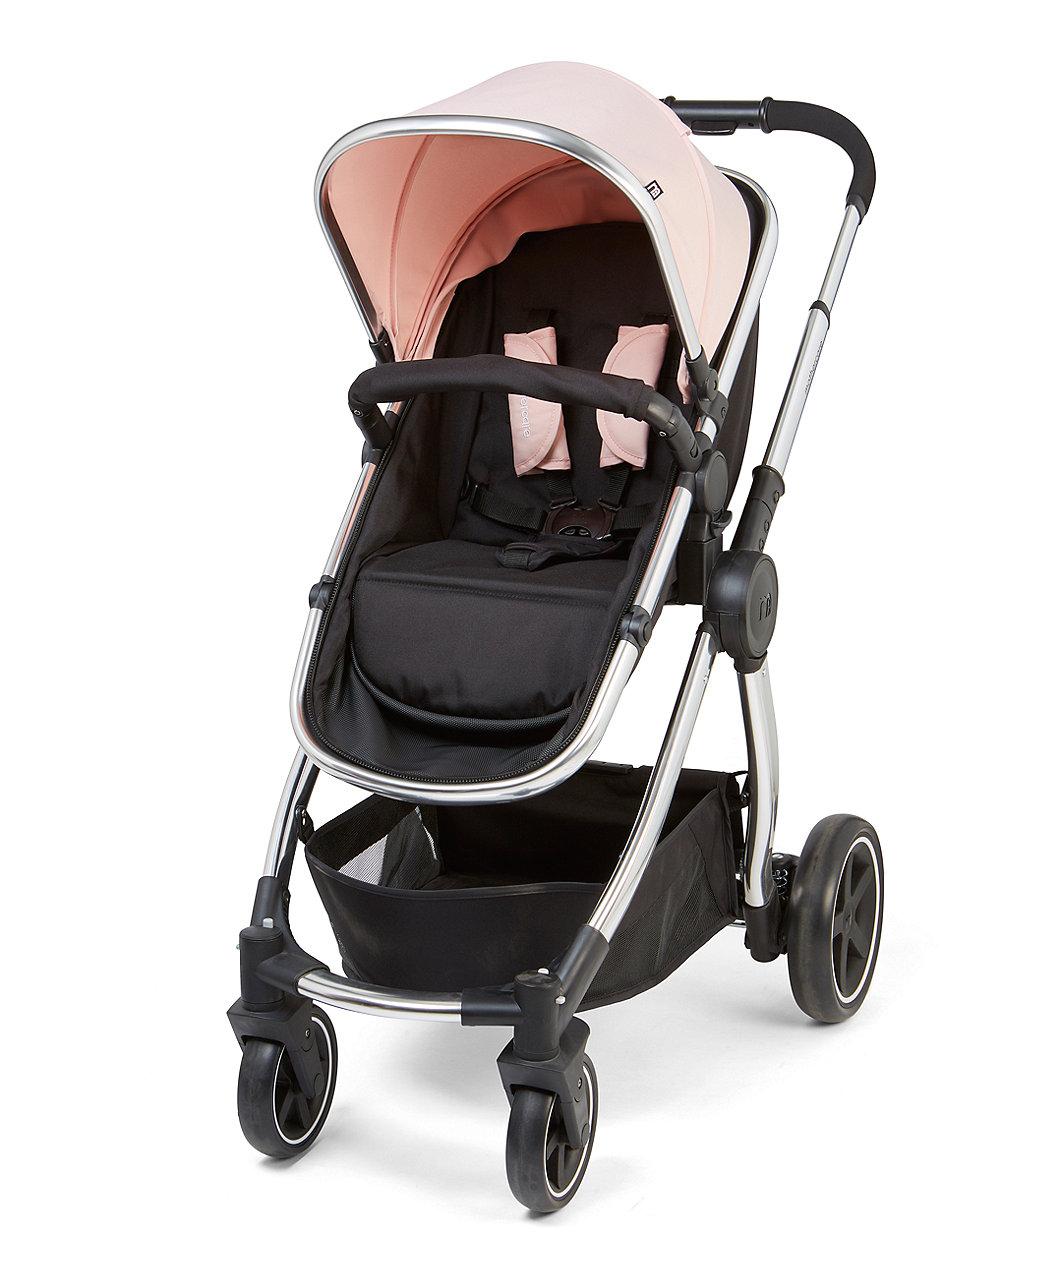 Mothercare 4 Wheel Journey Chrome Travel System Blush